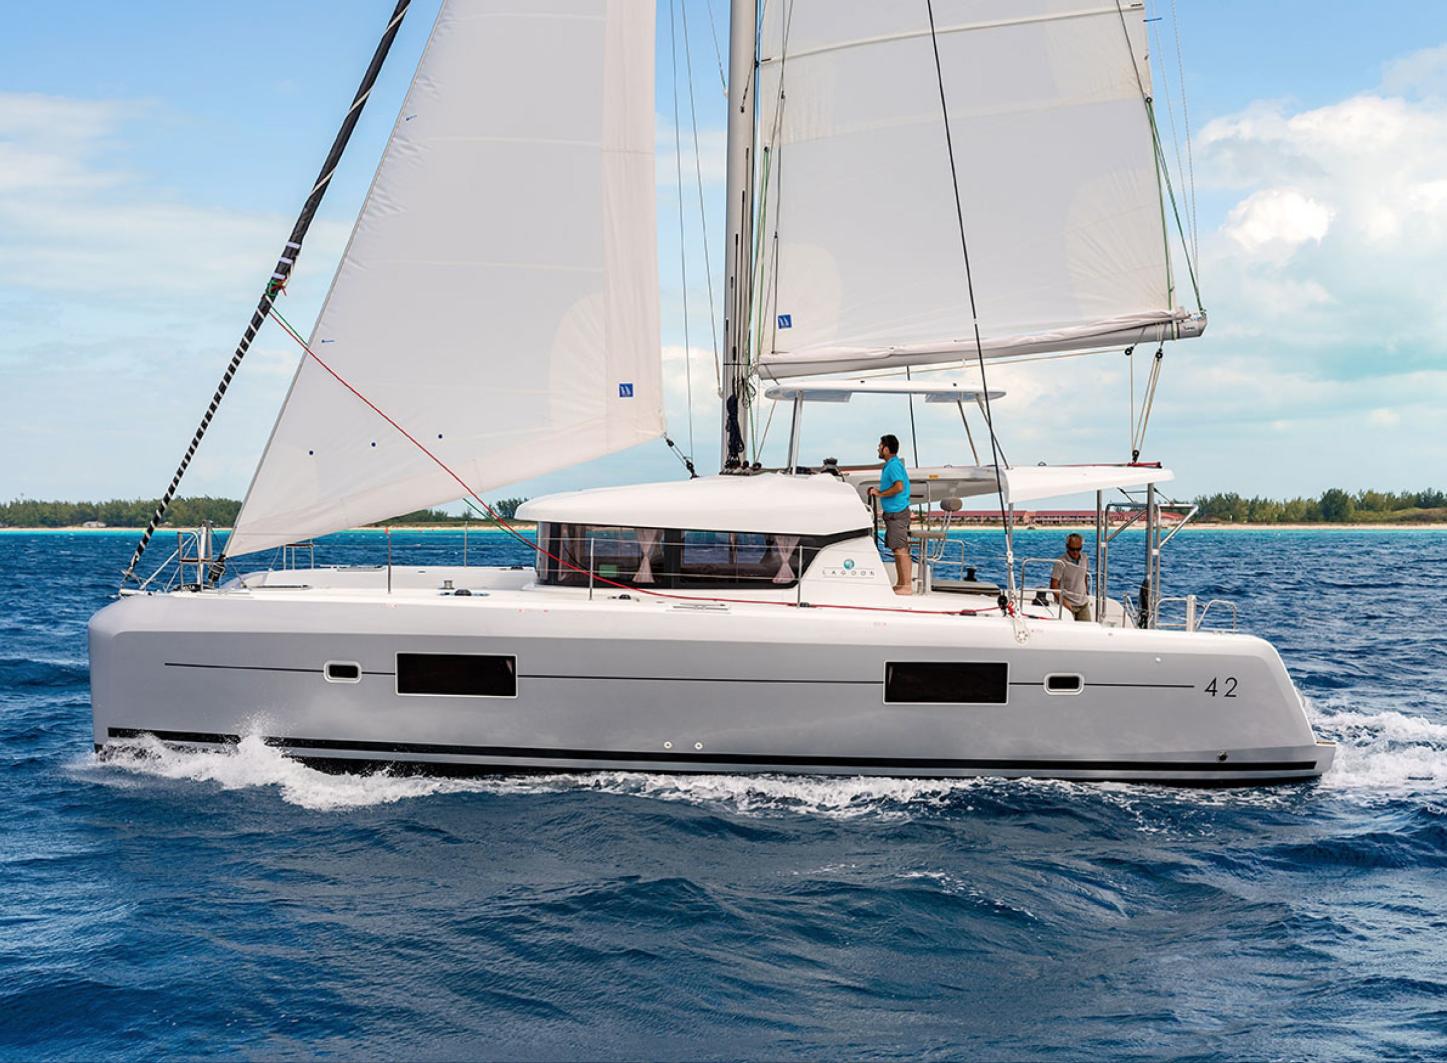 Lagoon 42 - Catamaran for charter in Greece - Eversails Chartering